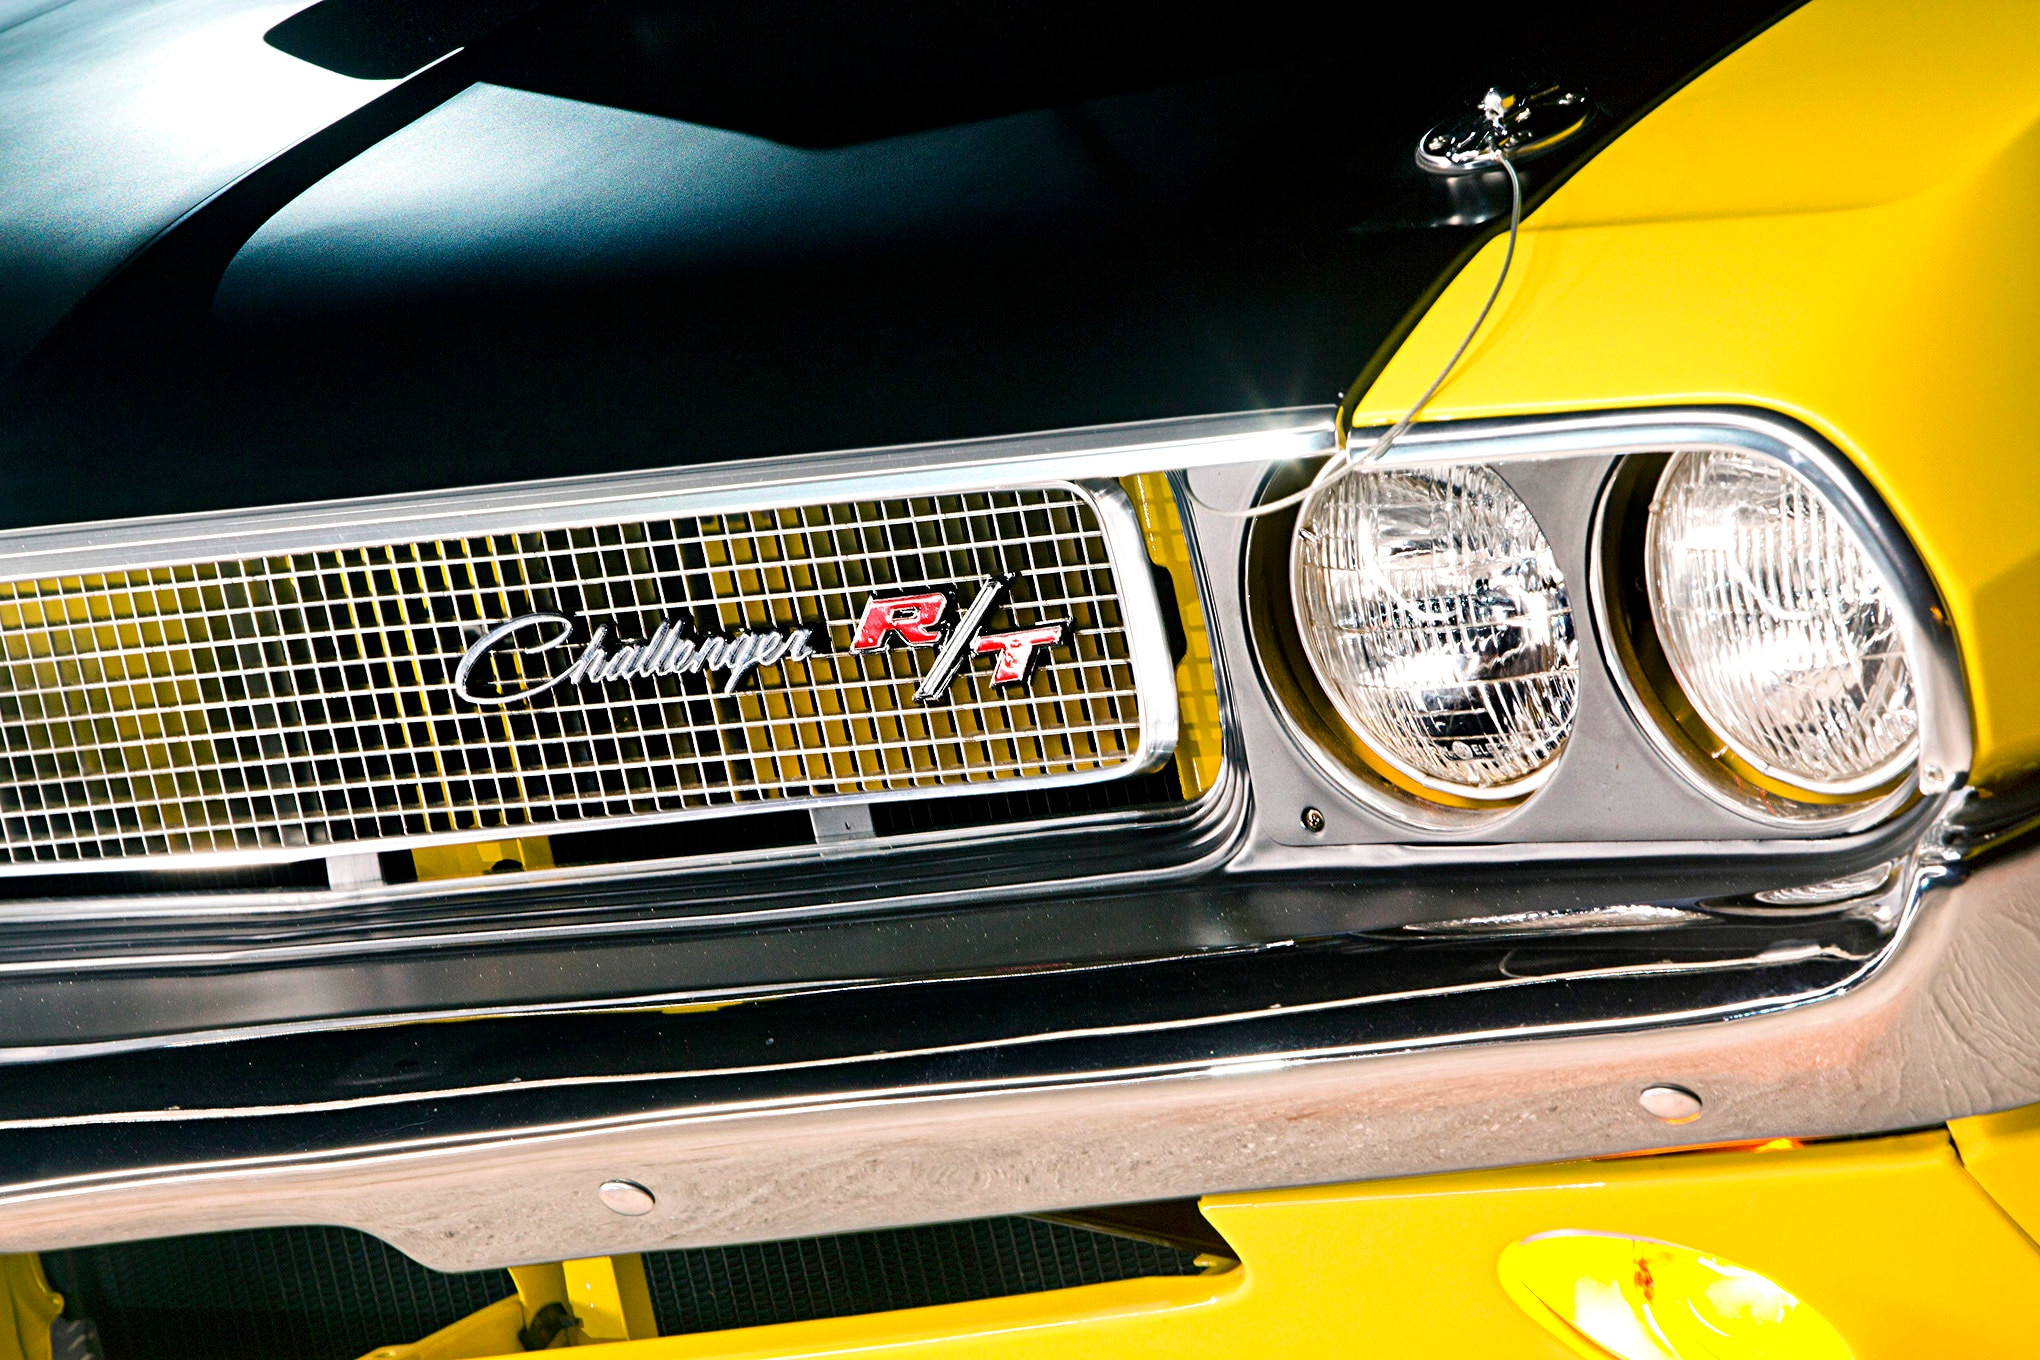 1970-dodge-challenger-rt-headlight-grille-closeup